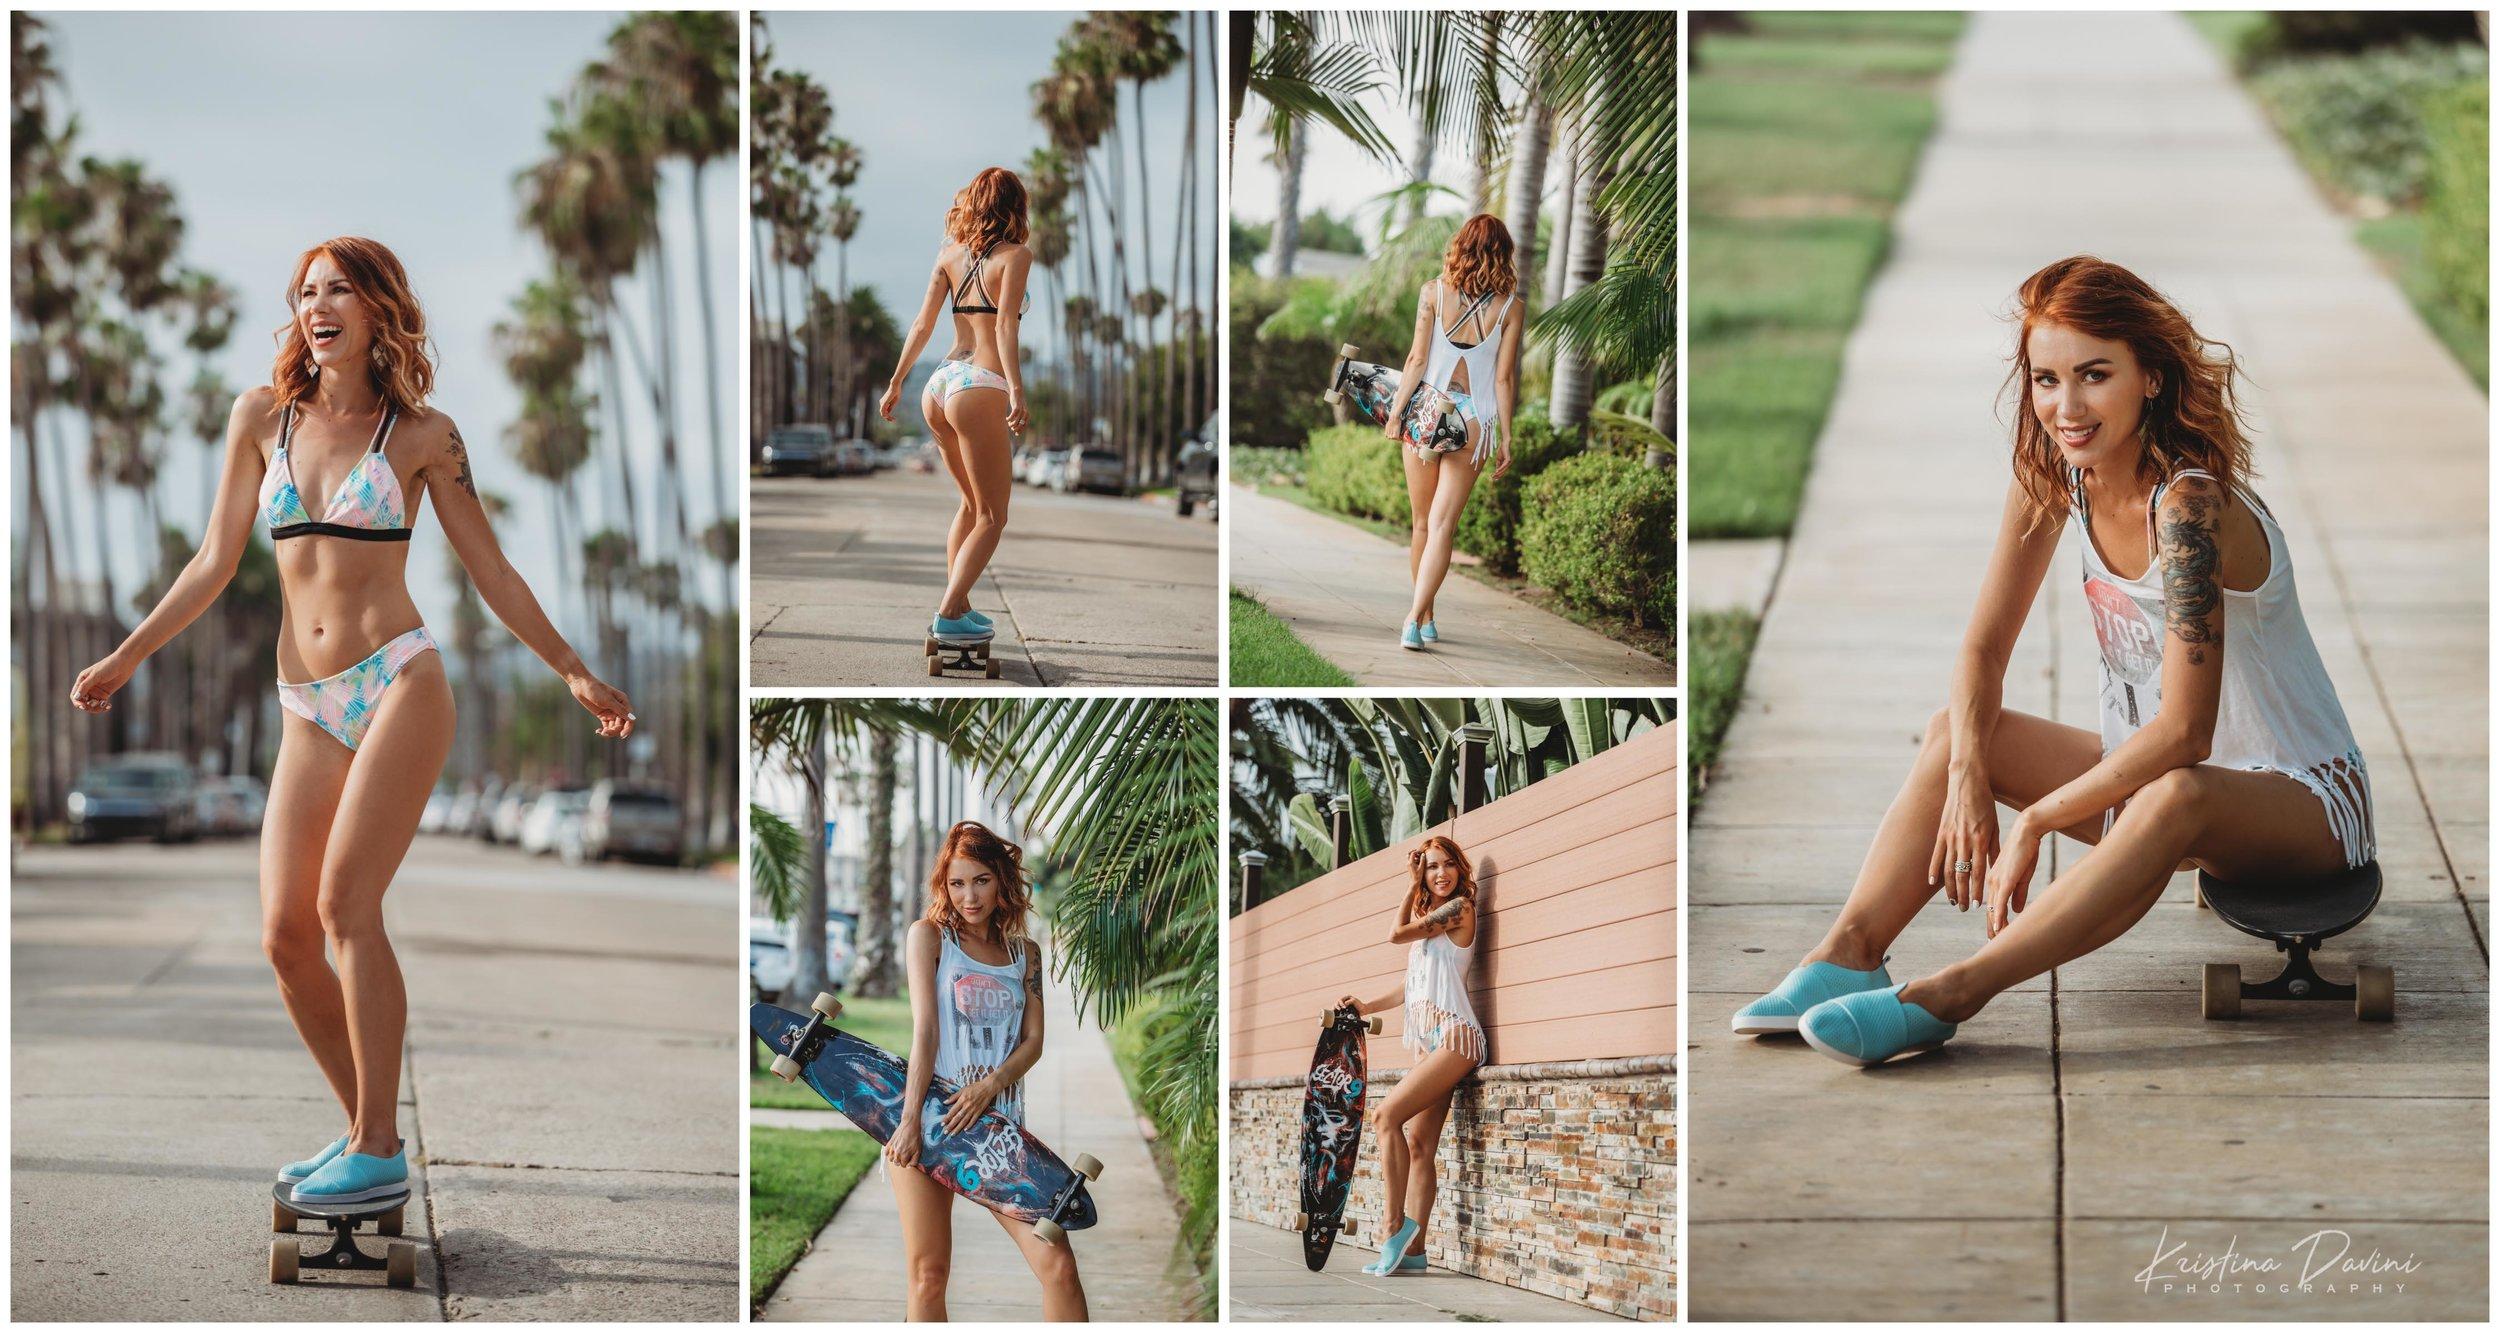 Skateboard Cali Girl